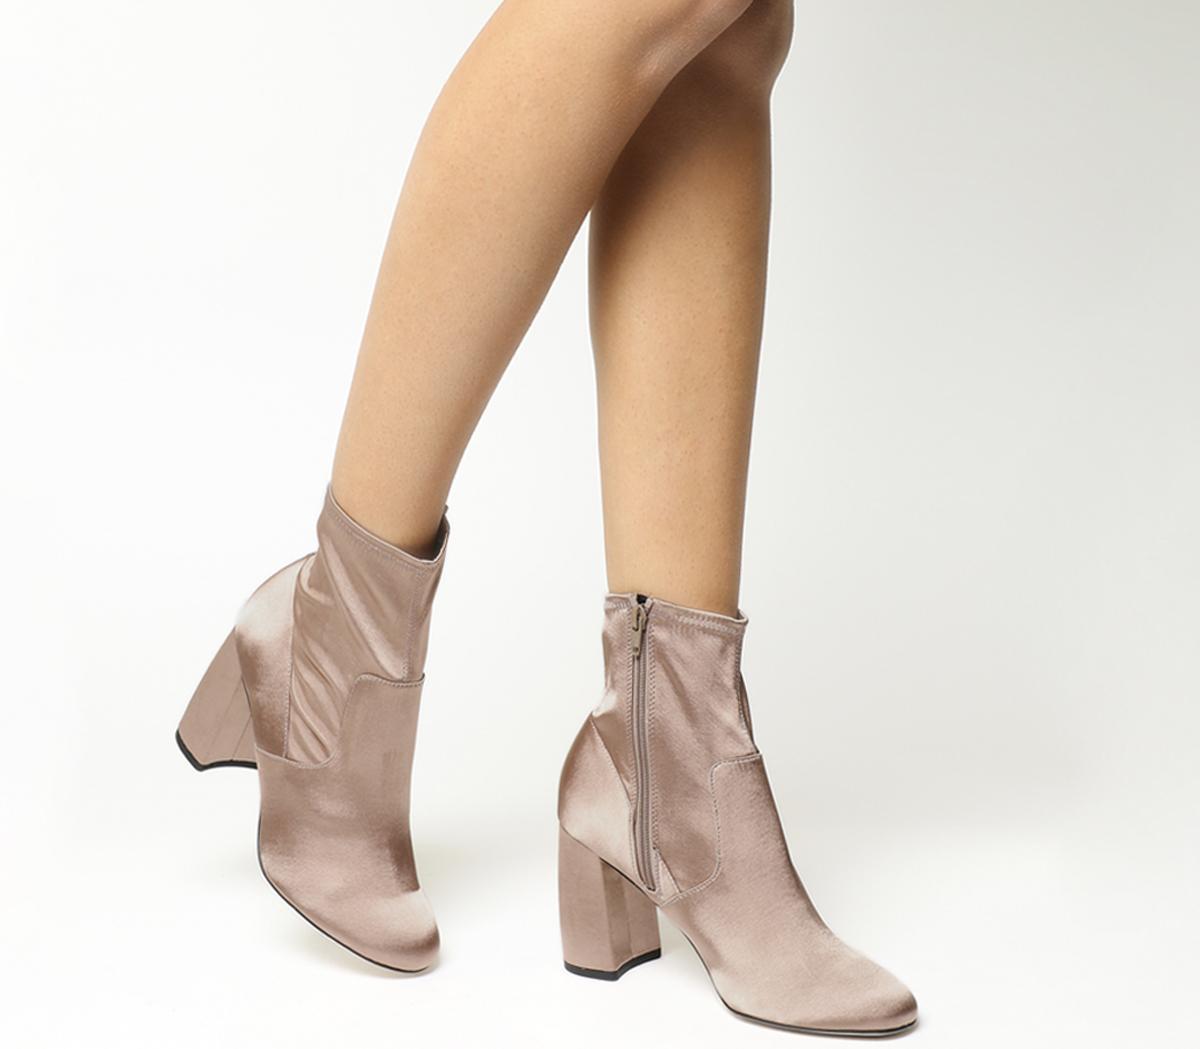 Alter Ego High Cut Boots